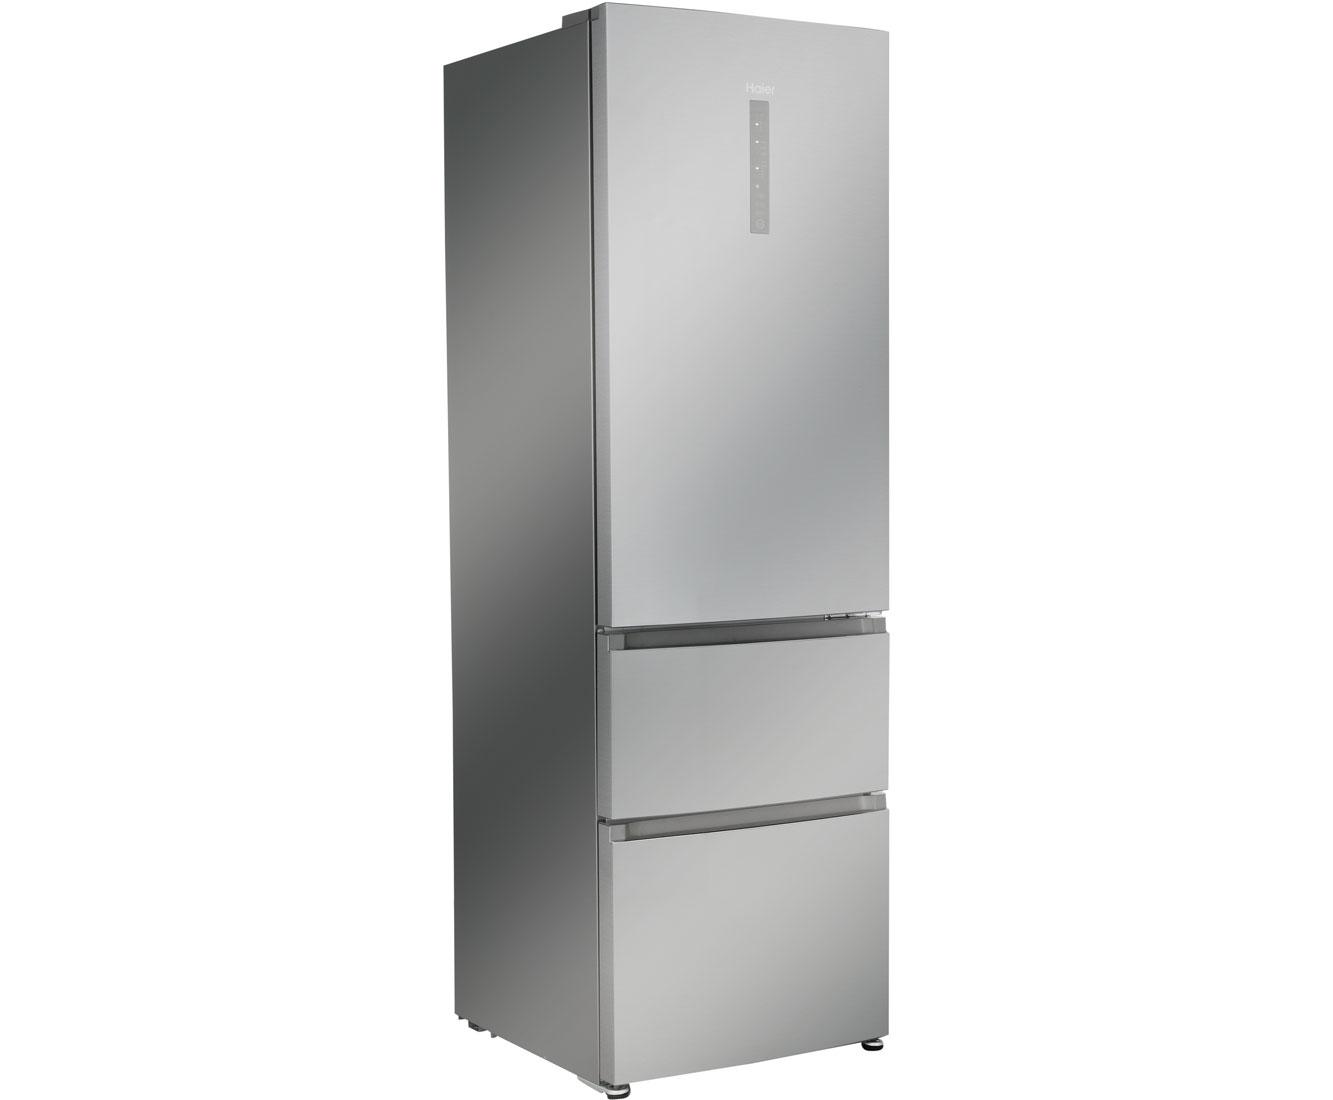 Kühlschrank Haier : Haier a fe cwj kühl gefrierkombination weiß